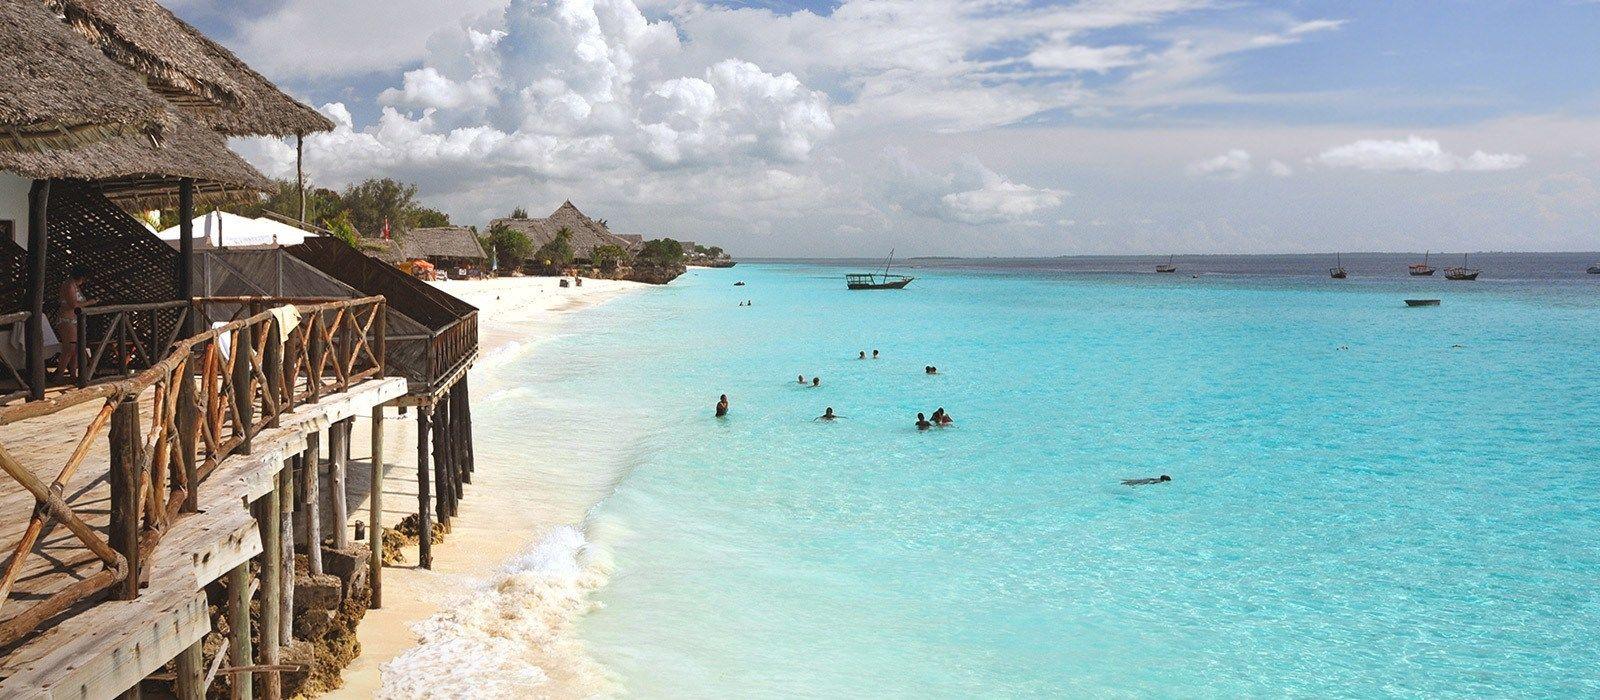 Classic Tanzania and Zanzibar Tour Trip 2